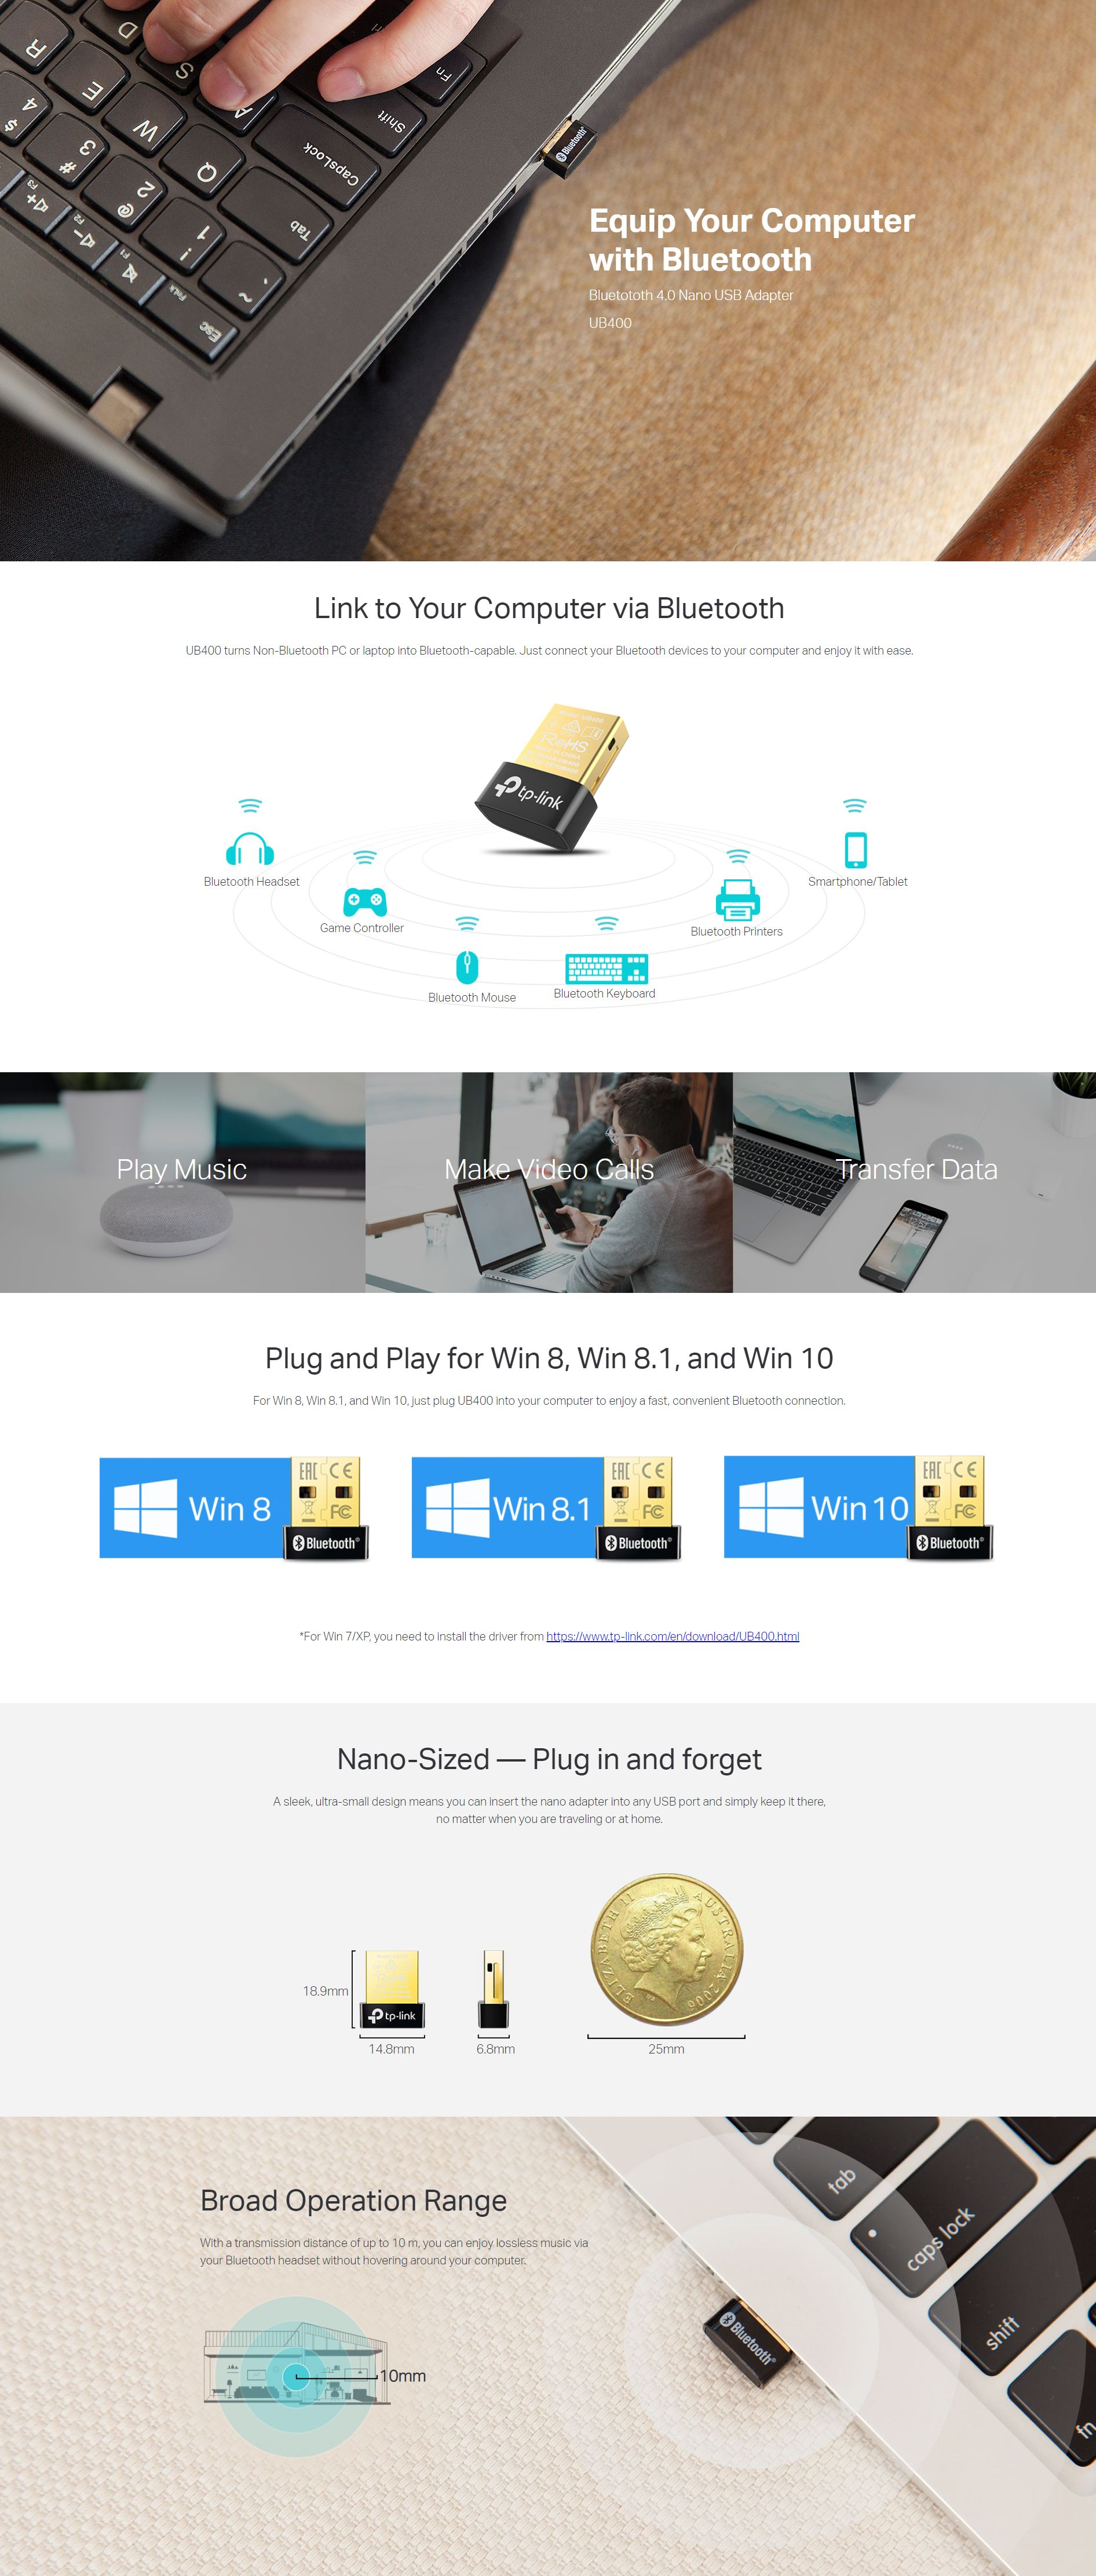 TP-Link Bluetooth 4 0 Nano USB Adapter (UB400)